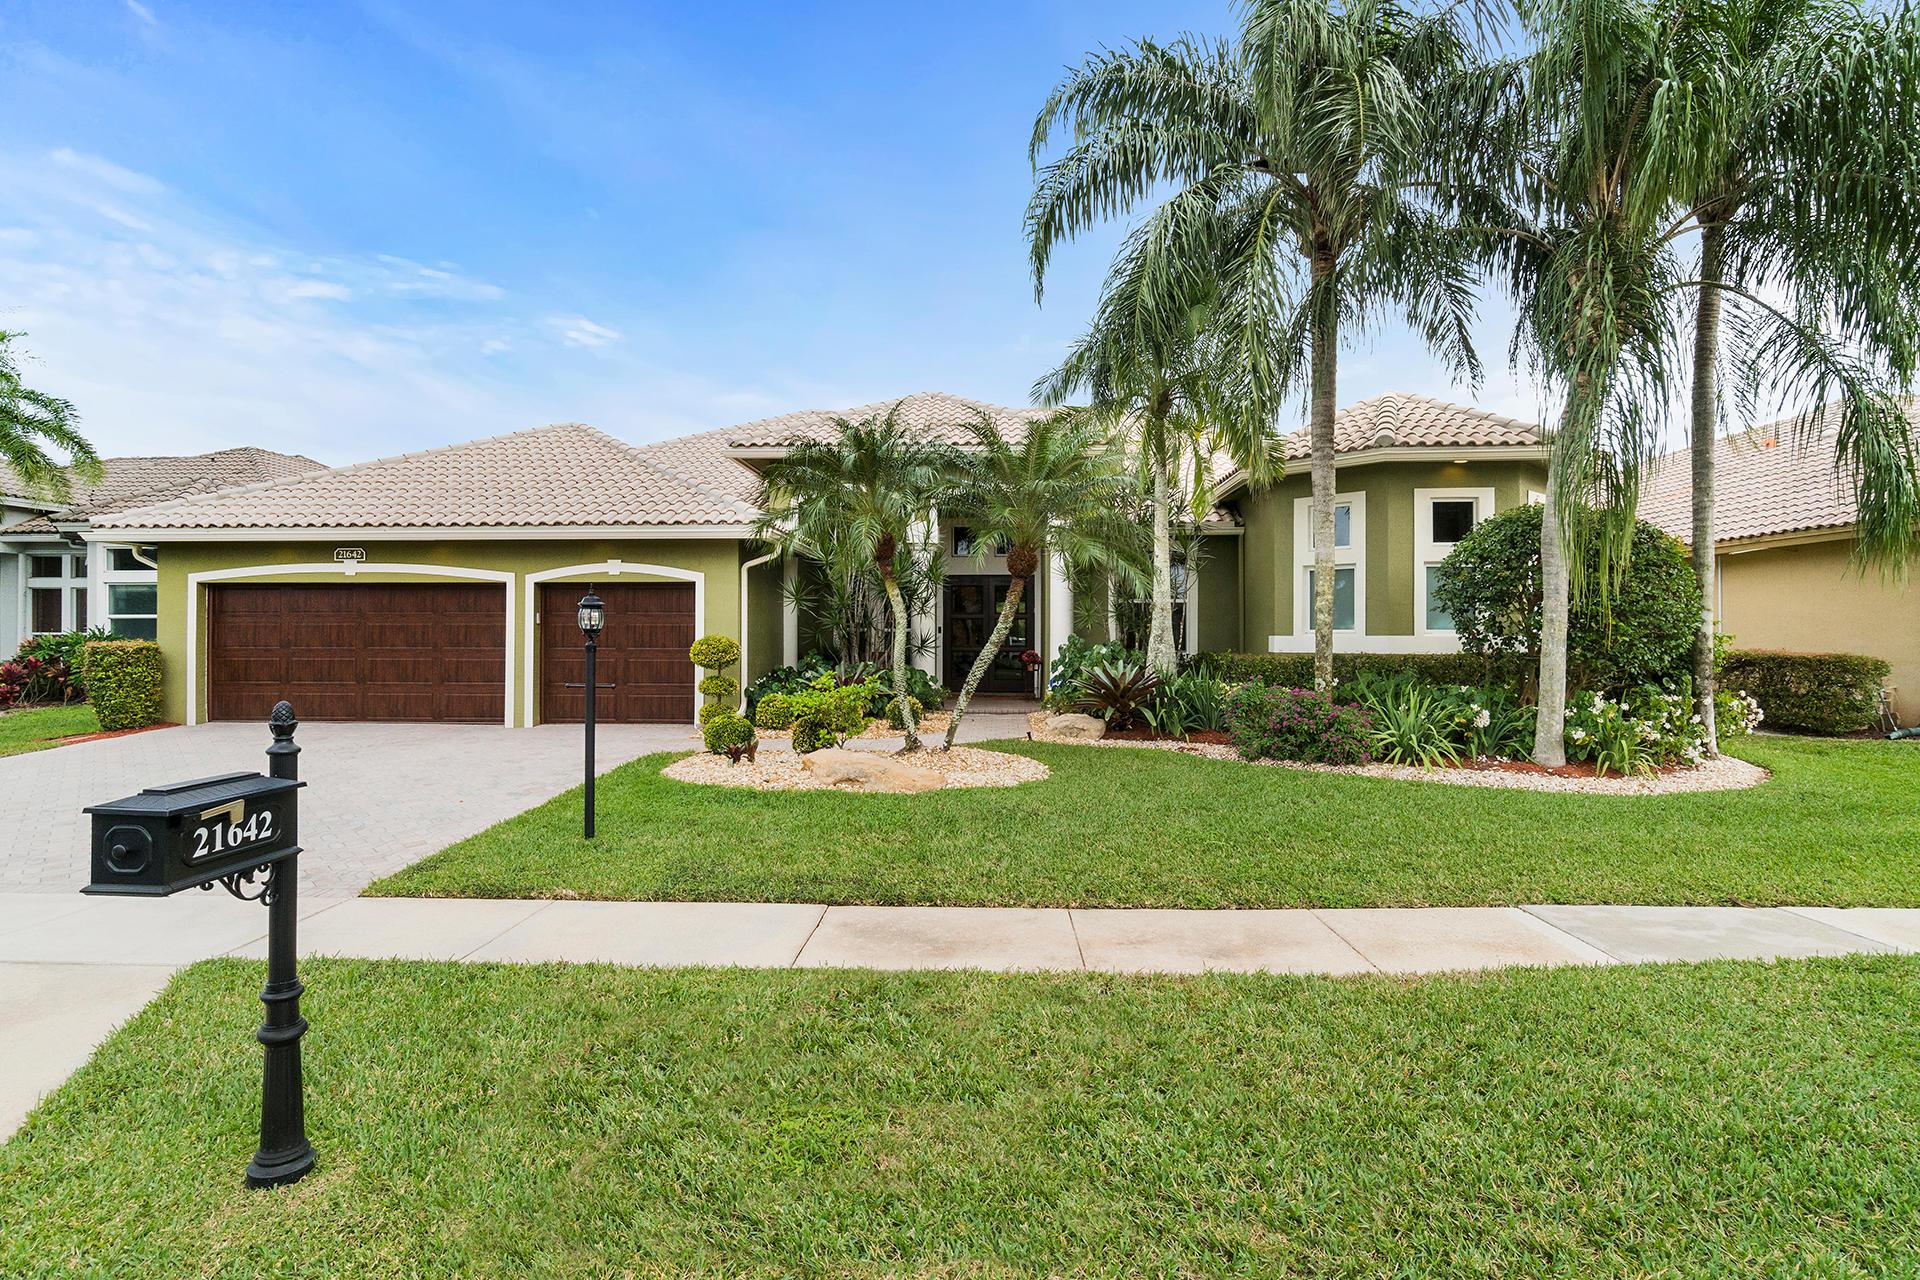 Photo of 21642 Marigot Drive, Boca Raton, FL 33428